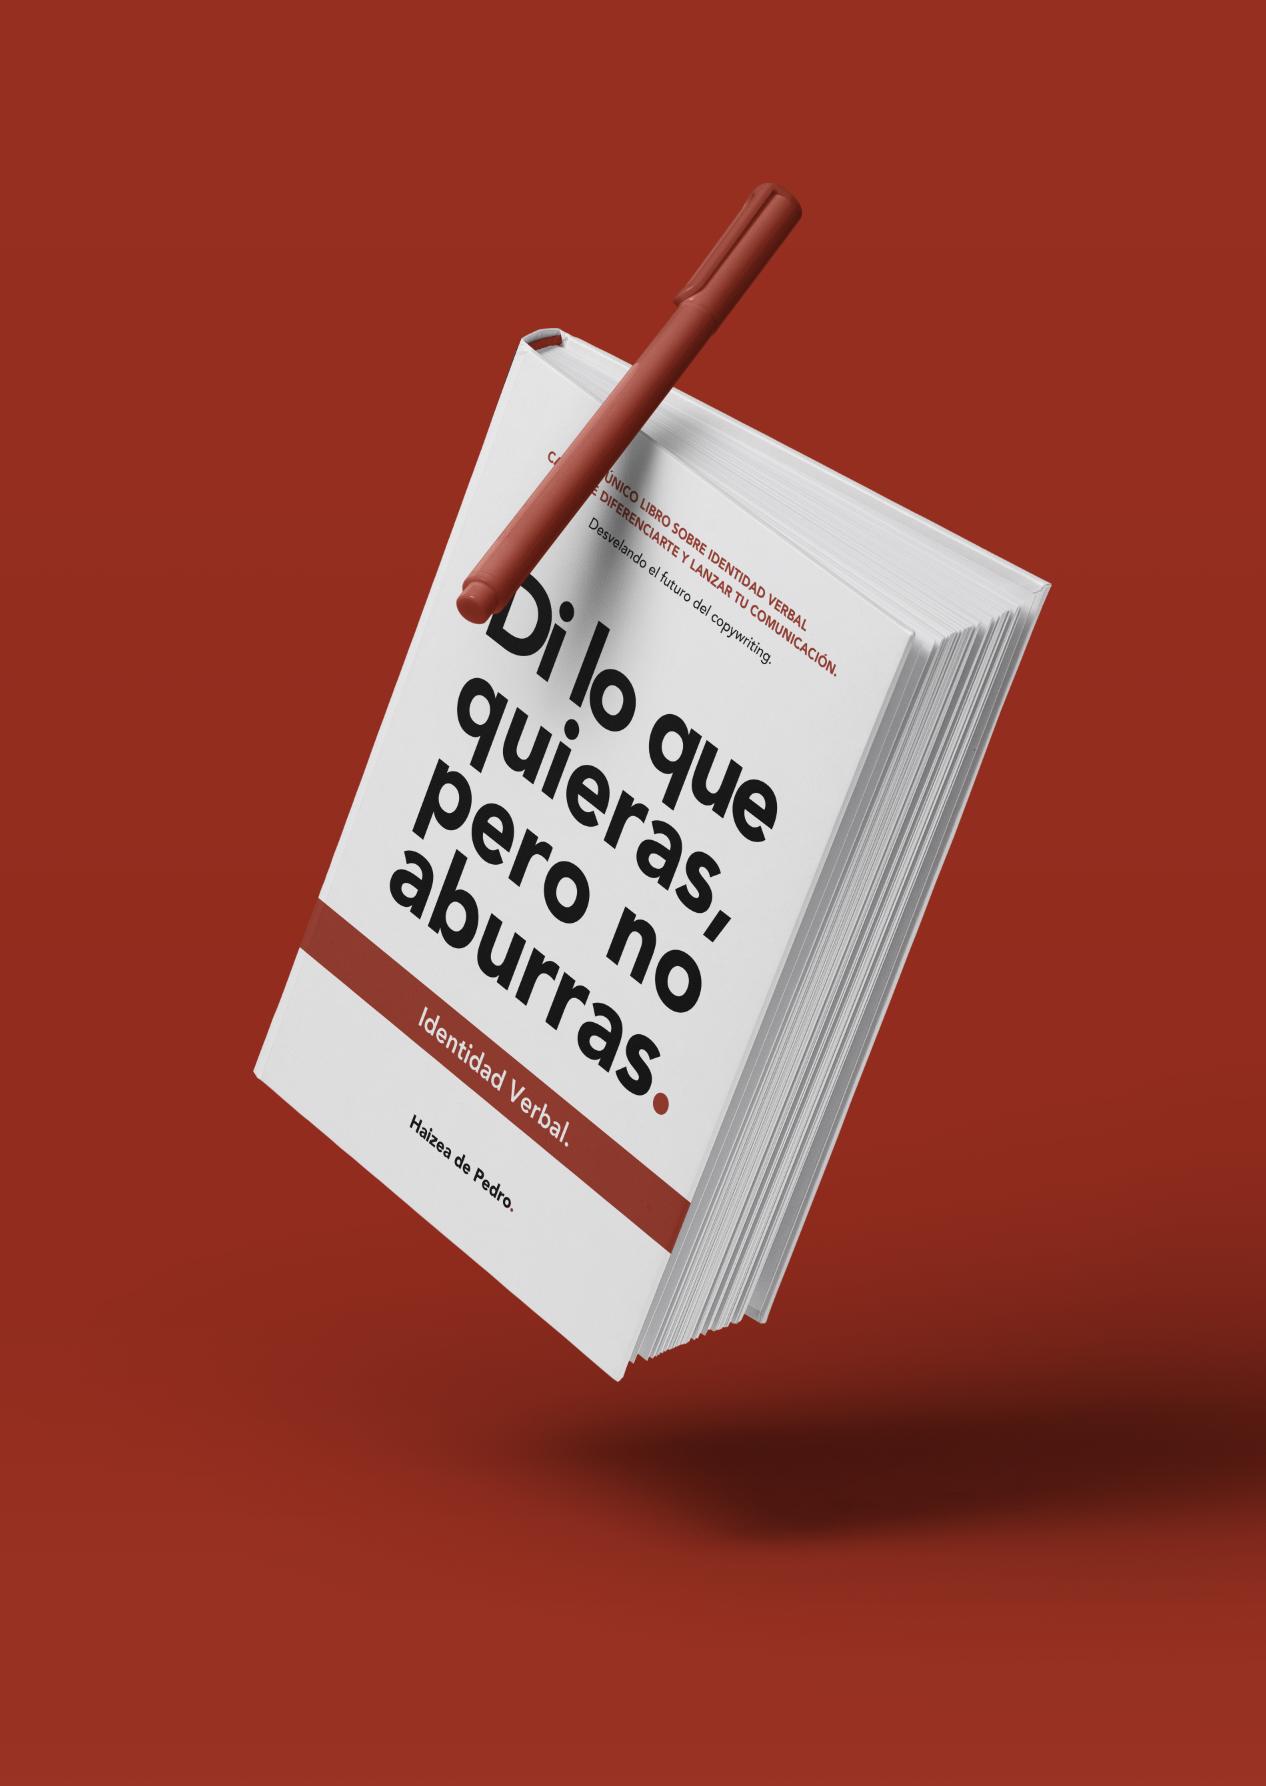 Identidad Verbal Copywriting Libro Haizea de Pedro